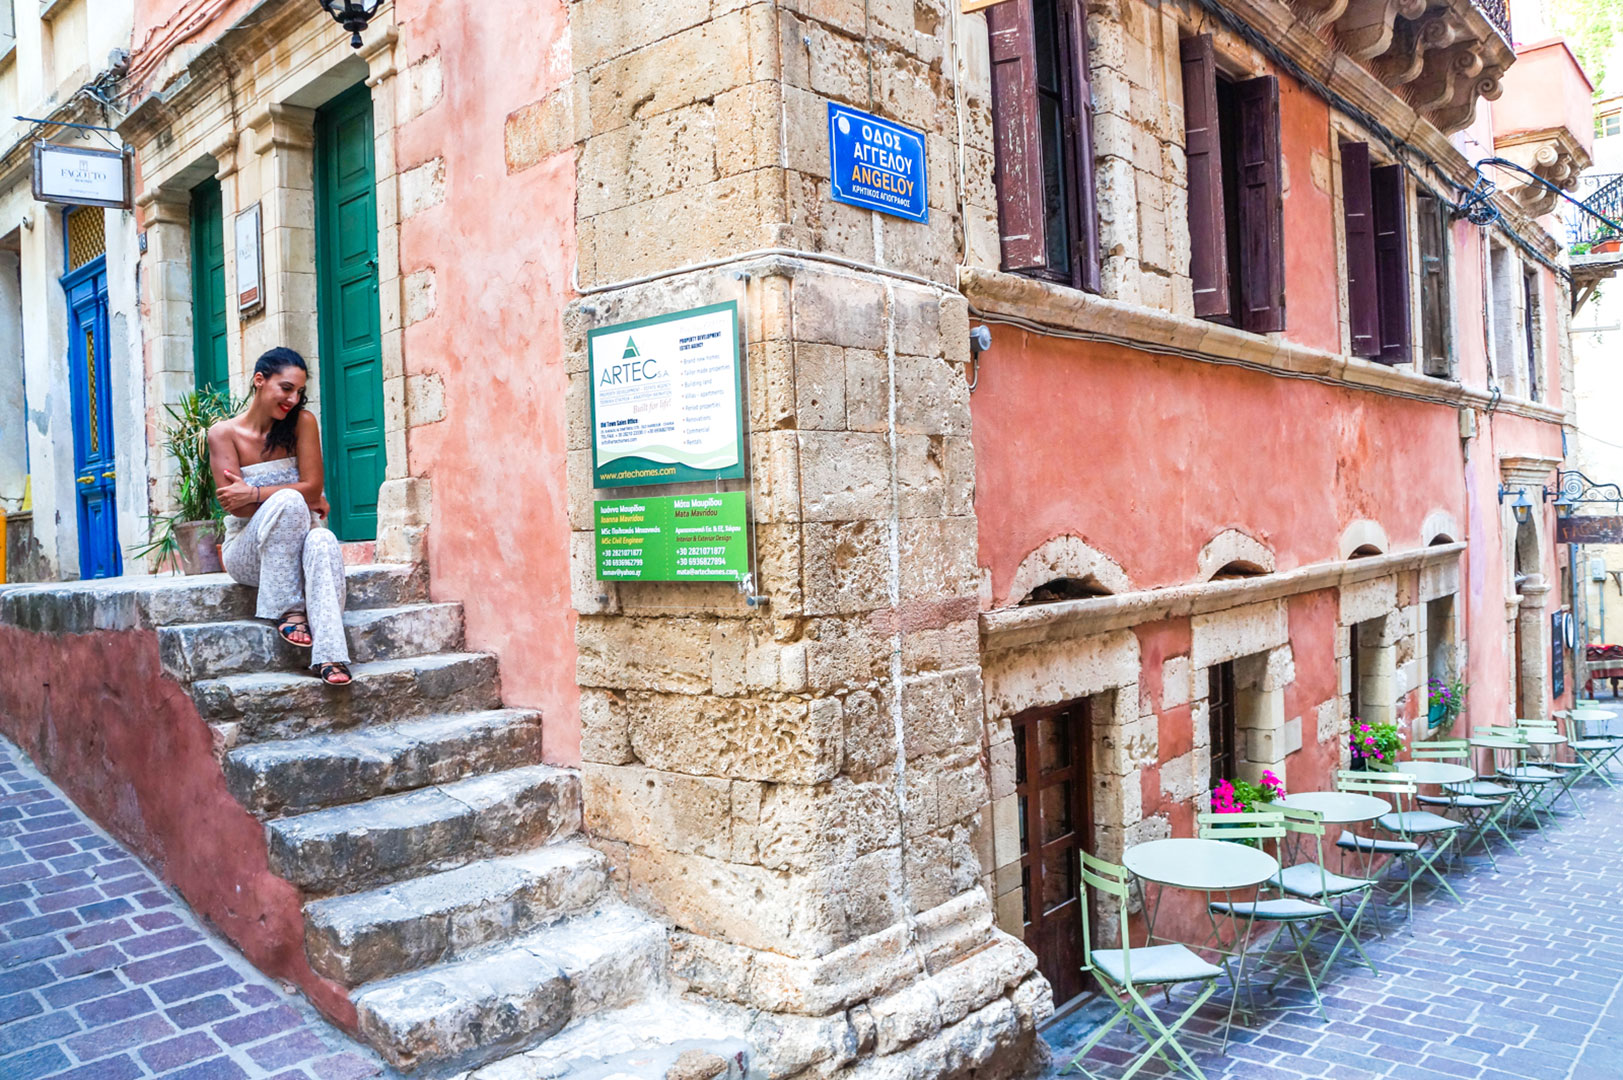 chania-crete-greece-la-vie-en-blog-all-rights-reserved-3